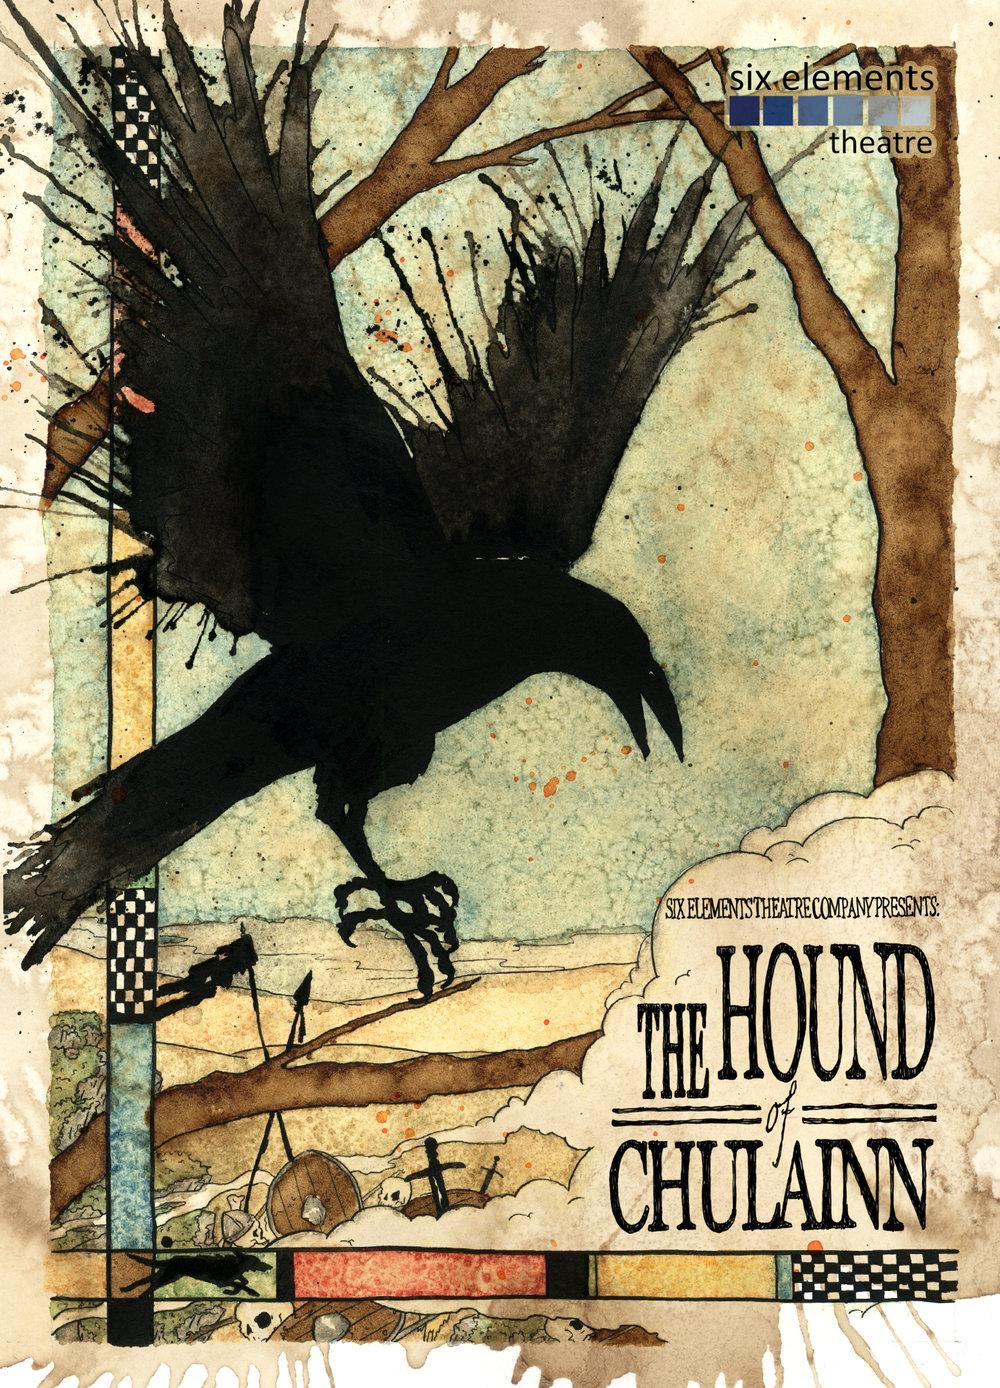 Hound of Chulainn Postcard